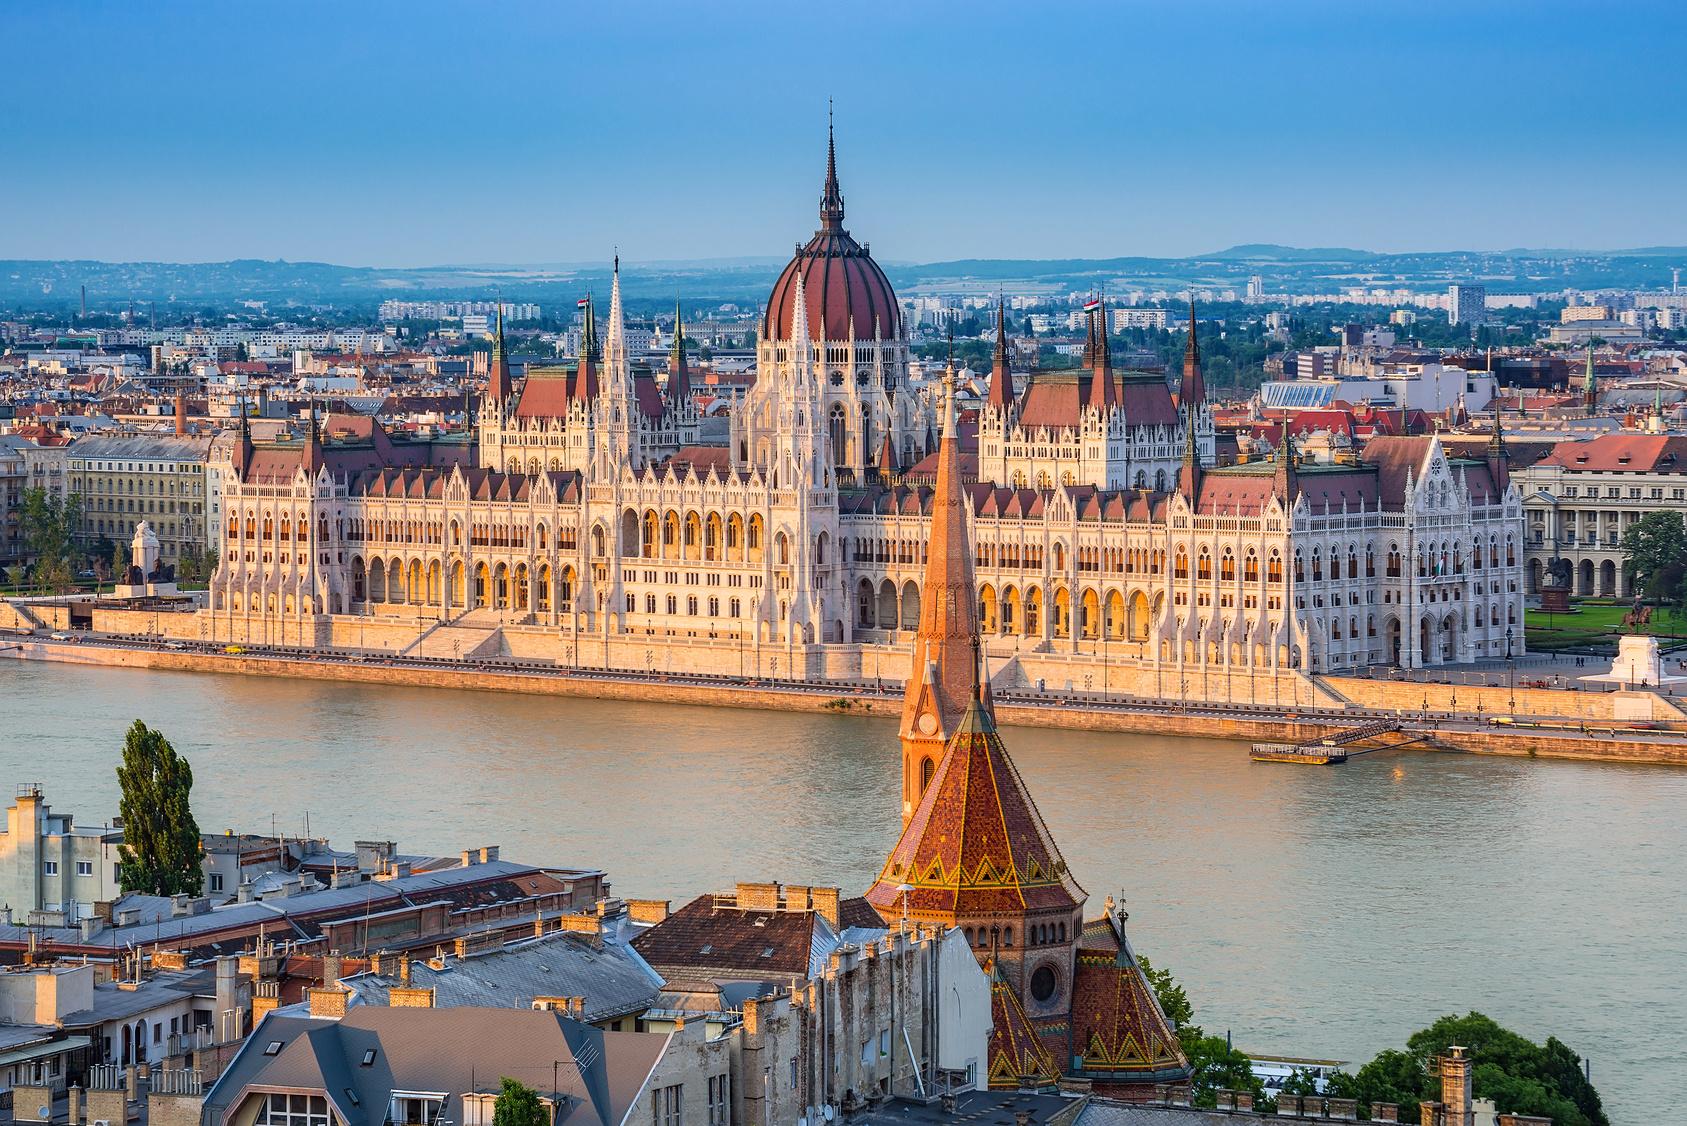 ВНЖ Венгрии на основании трудового договора